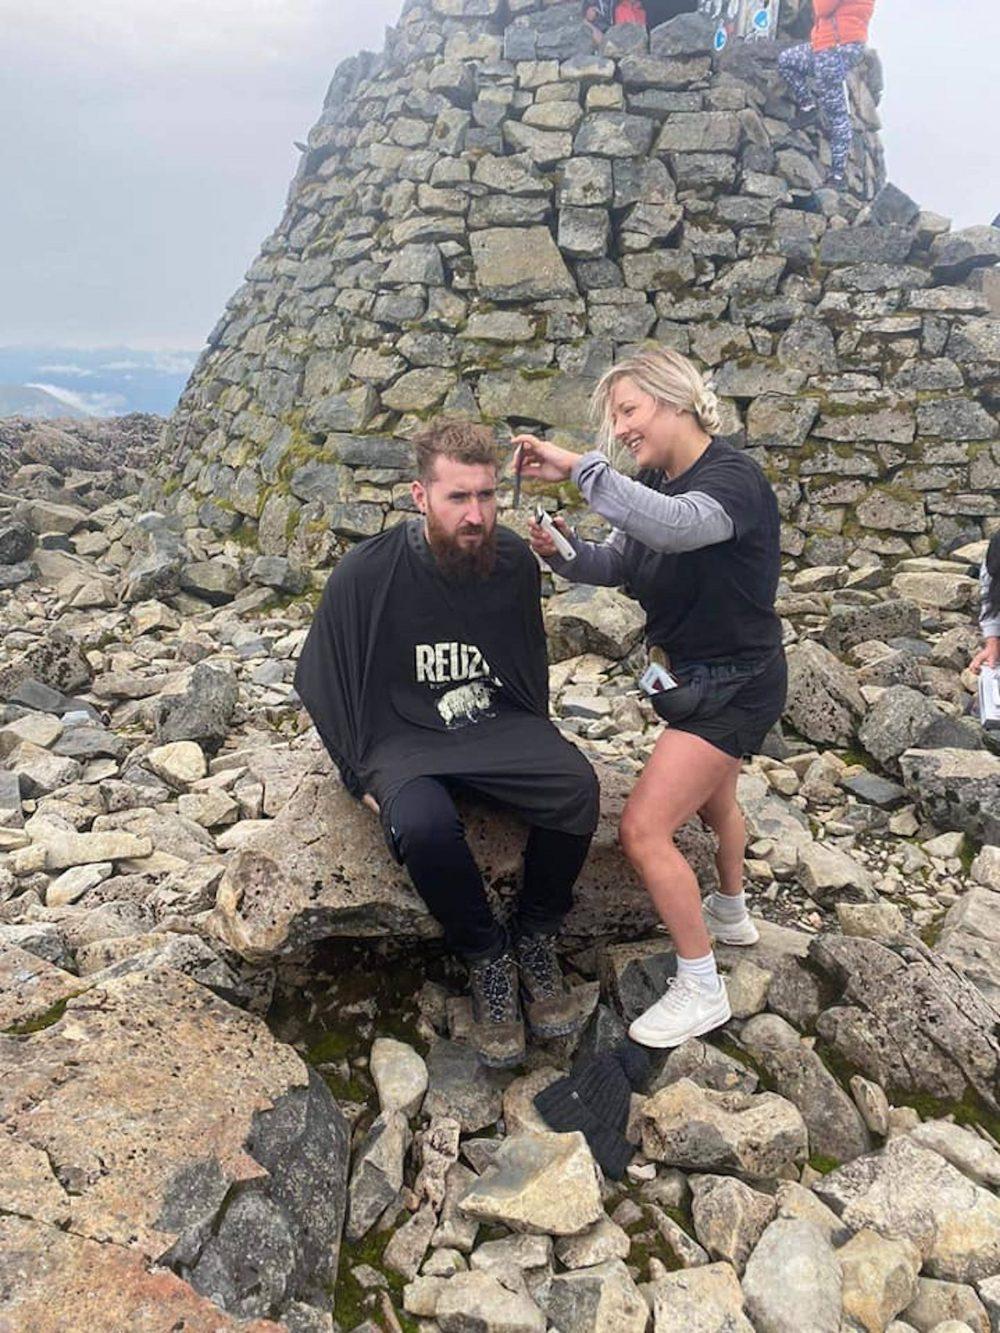 Owner Terri cutting hair on top of Ben Nevis   Scottish Nevis